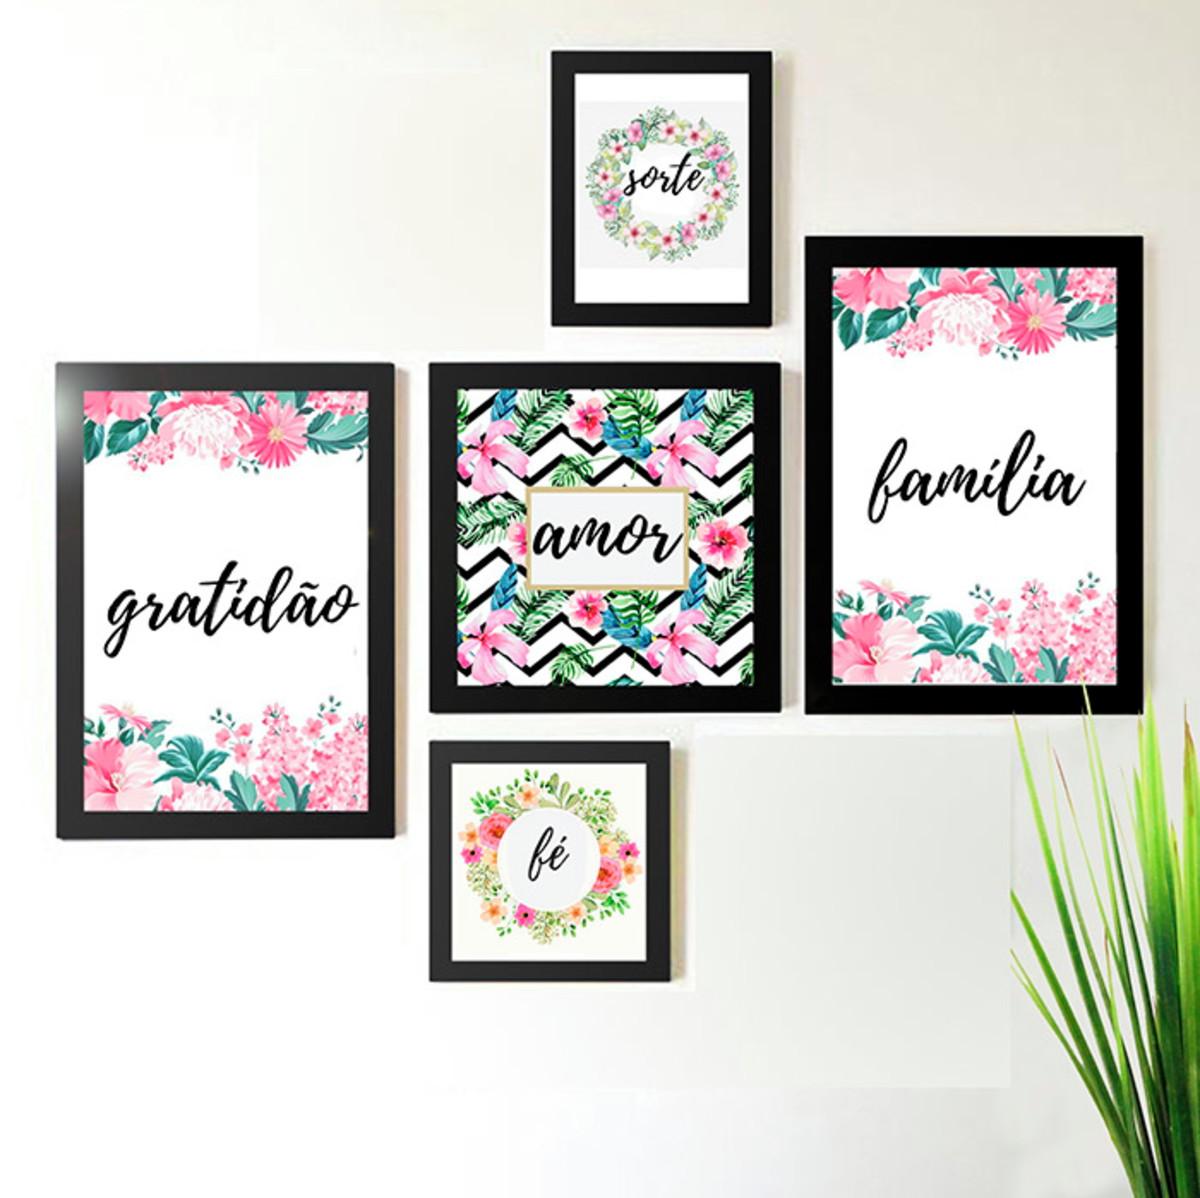 Conjunto 5 Quadros Floral Frases Amor Familia Gratidao No Elo7 Los